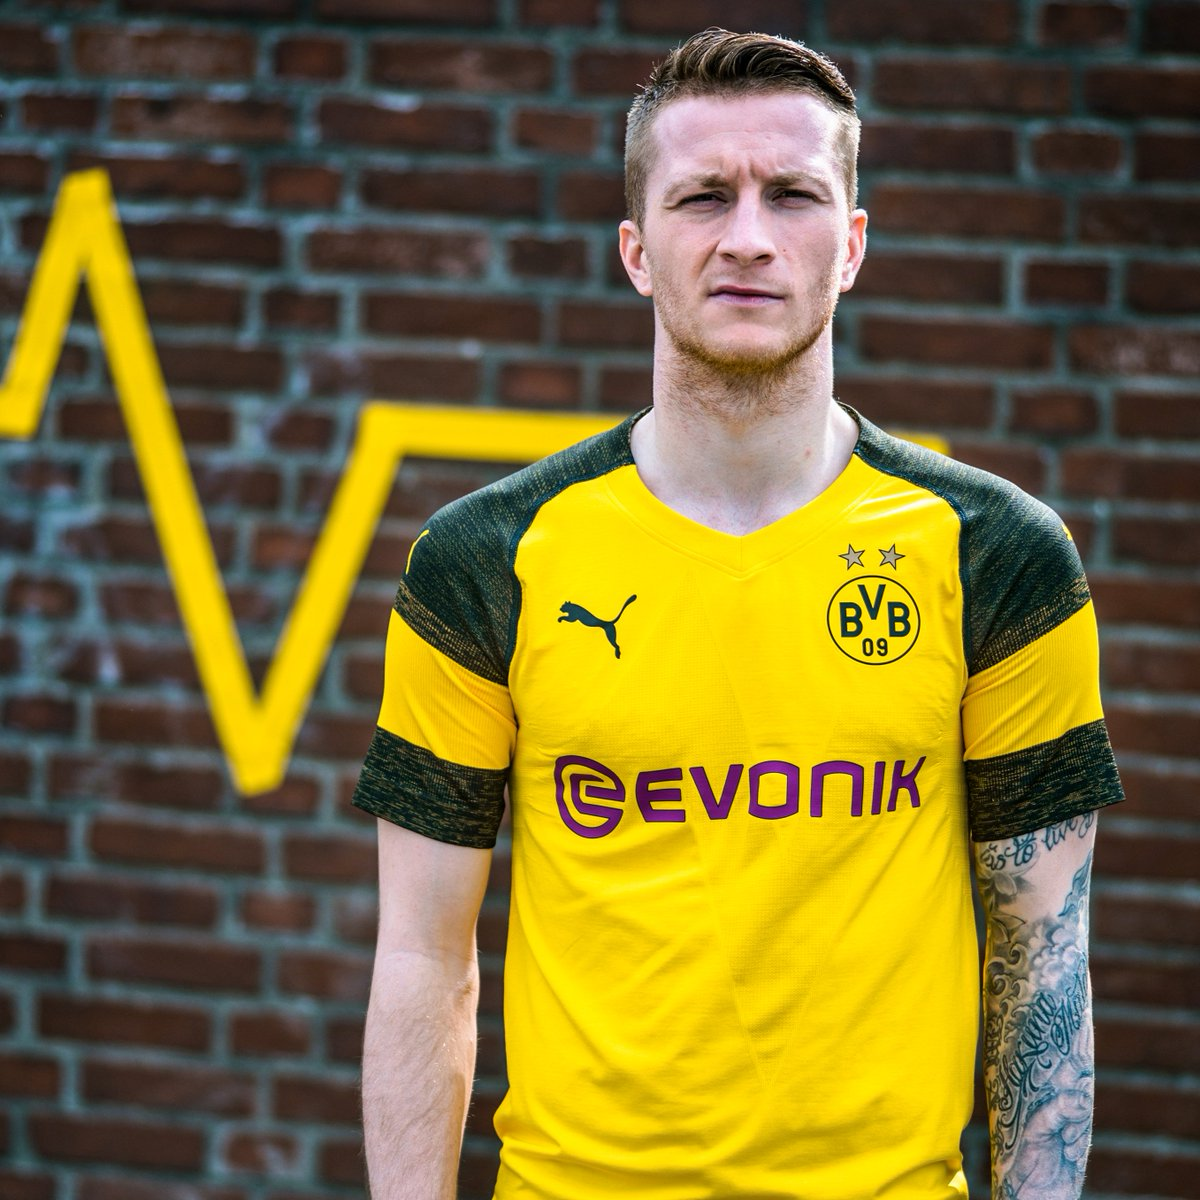 huge selection of 13f6a 5bc12 Marco Reus : Marco Reus models BVB kit pumafootball | B/R ...